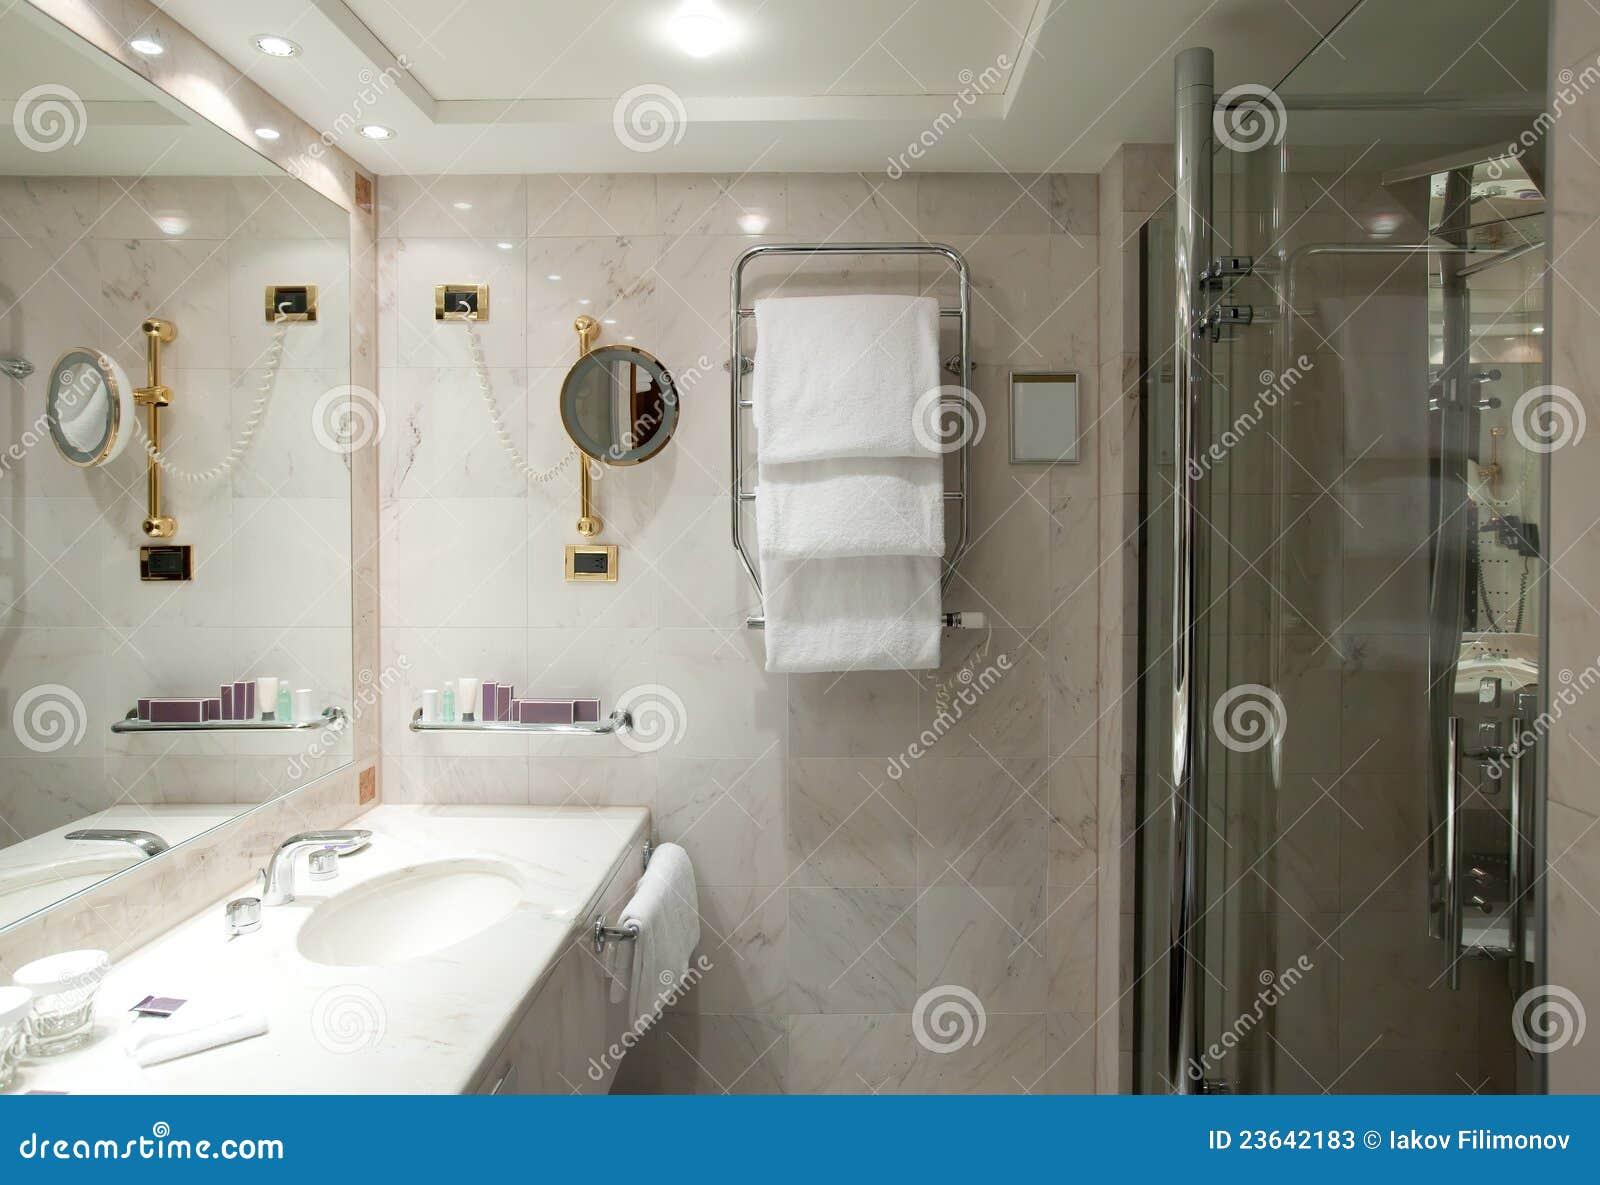 Ванная комната дизайн потолки